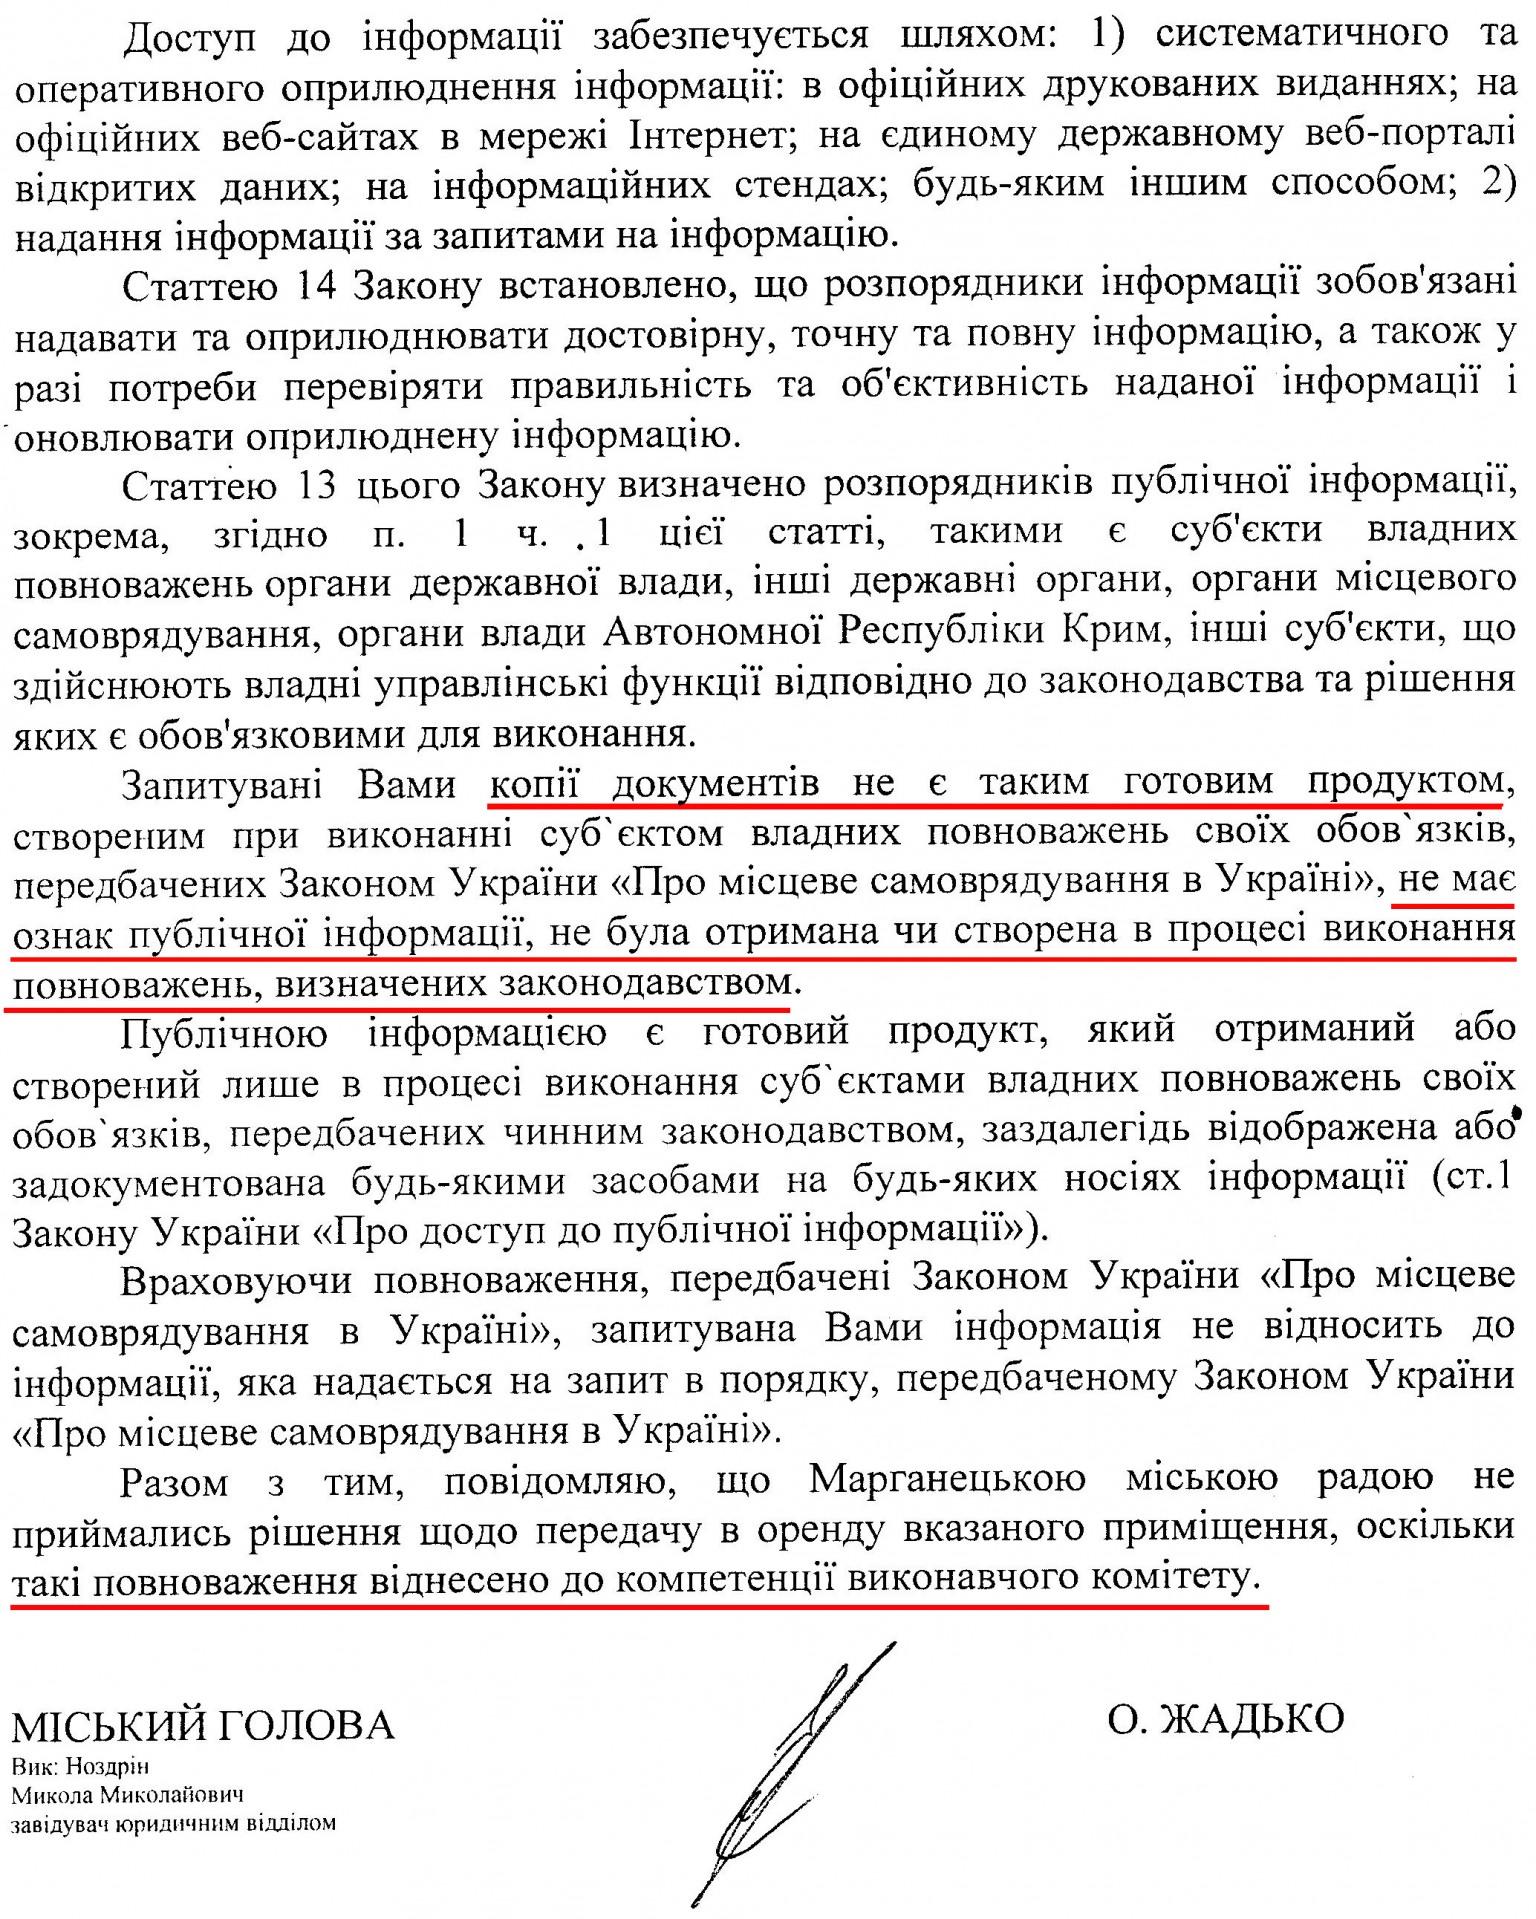 06-5c5af6e6c3c7b-mr_margantsa_i_deputat_oblsoveta_dali_protivopoloz.original